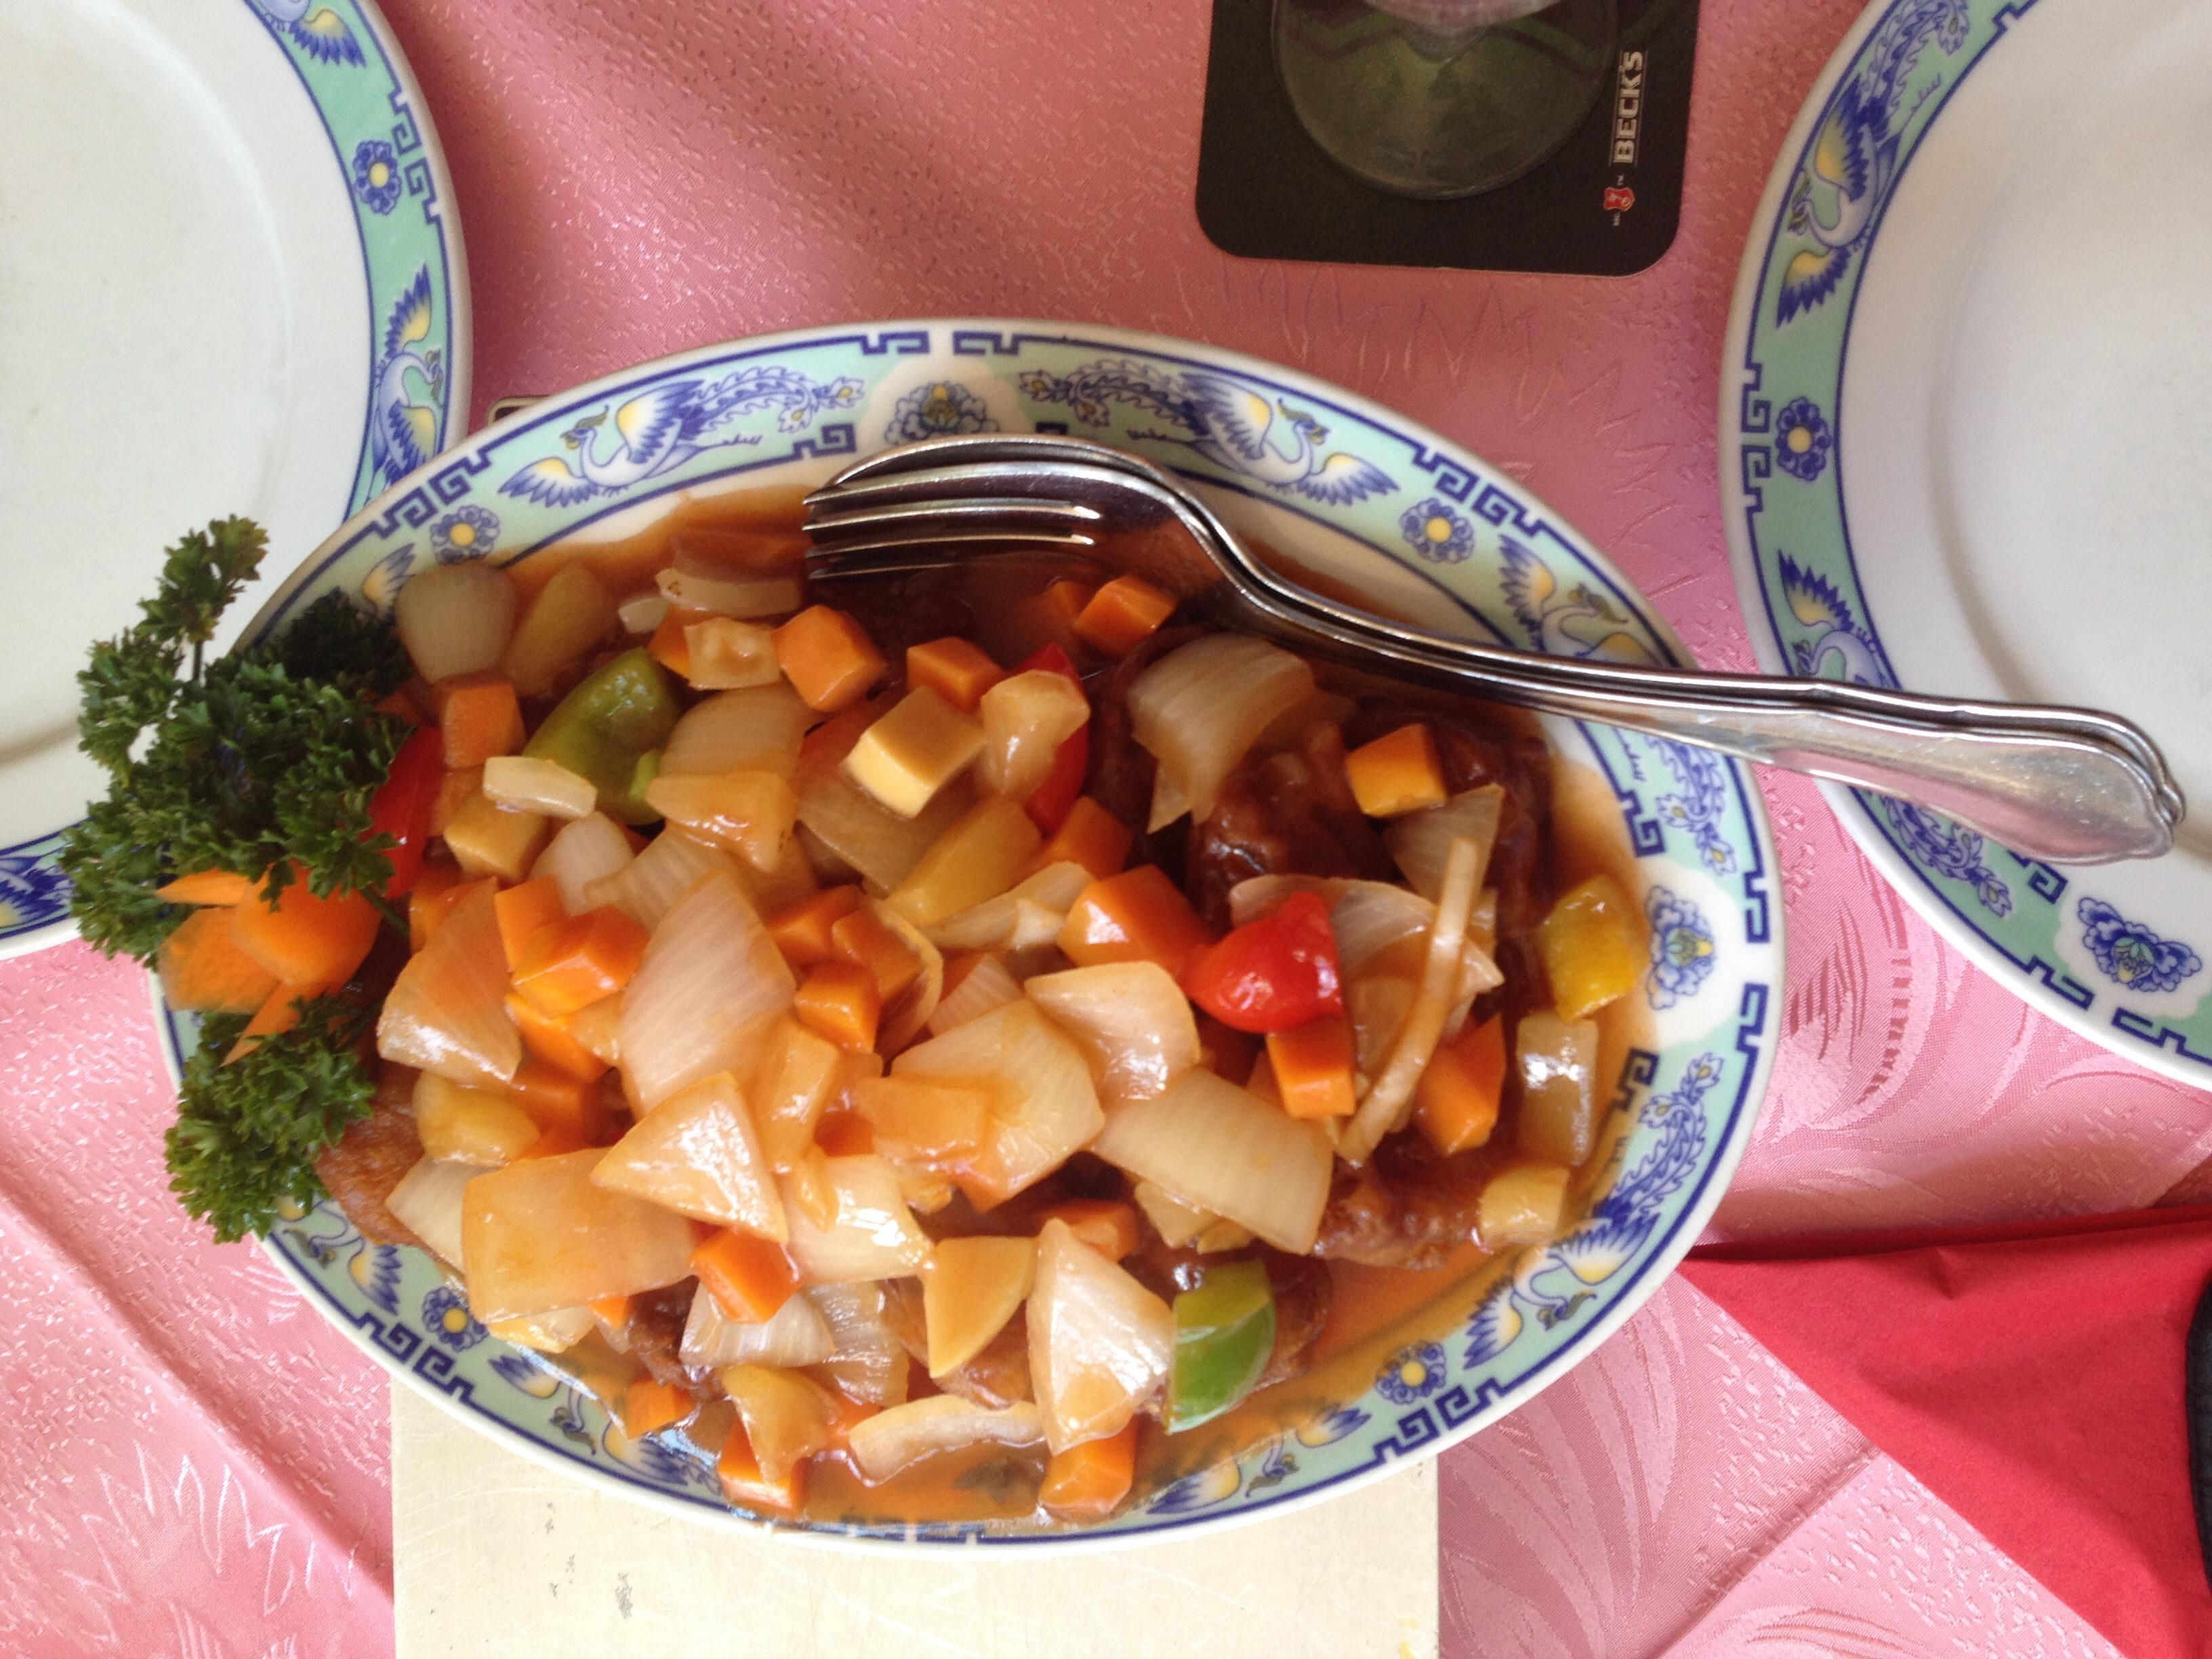 https://foodloader.net/BrollyLSSJ_2015-08-09_Sentosa_-_Schweinefleisch_gebacken_s_____sauer.jpg